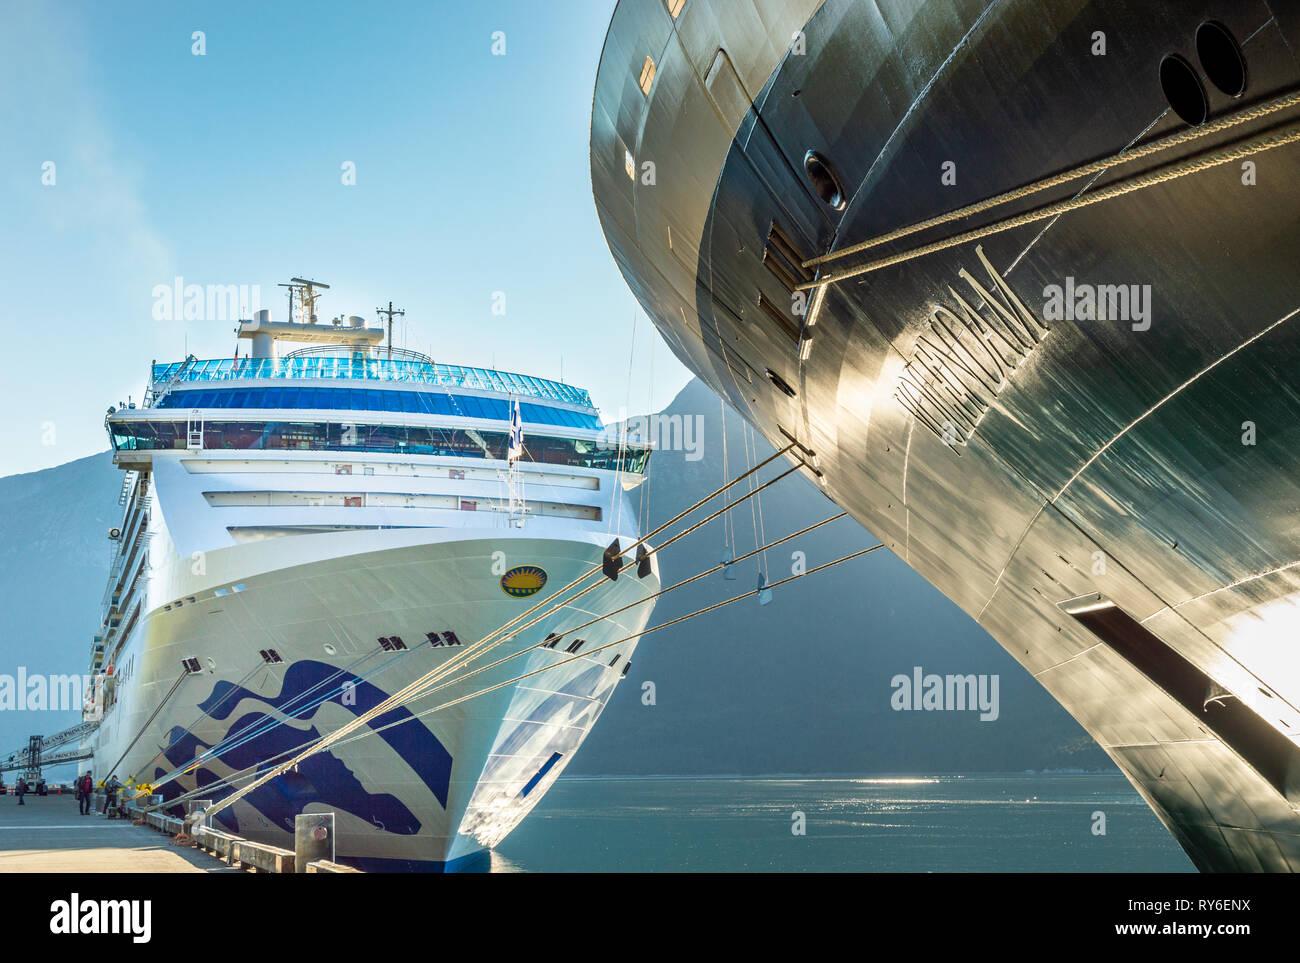 September 15, 2018 - Skagway, AK: The Volendam and Island Princess cruise ships. - Stock Image